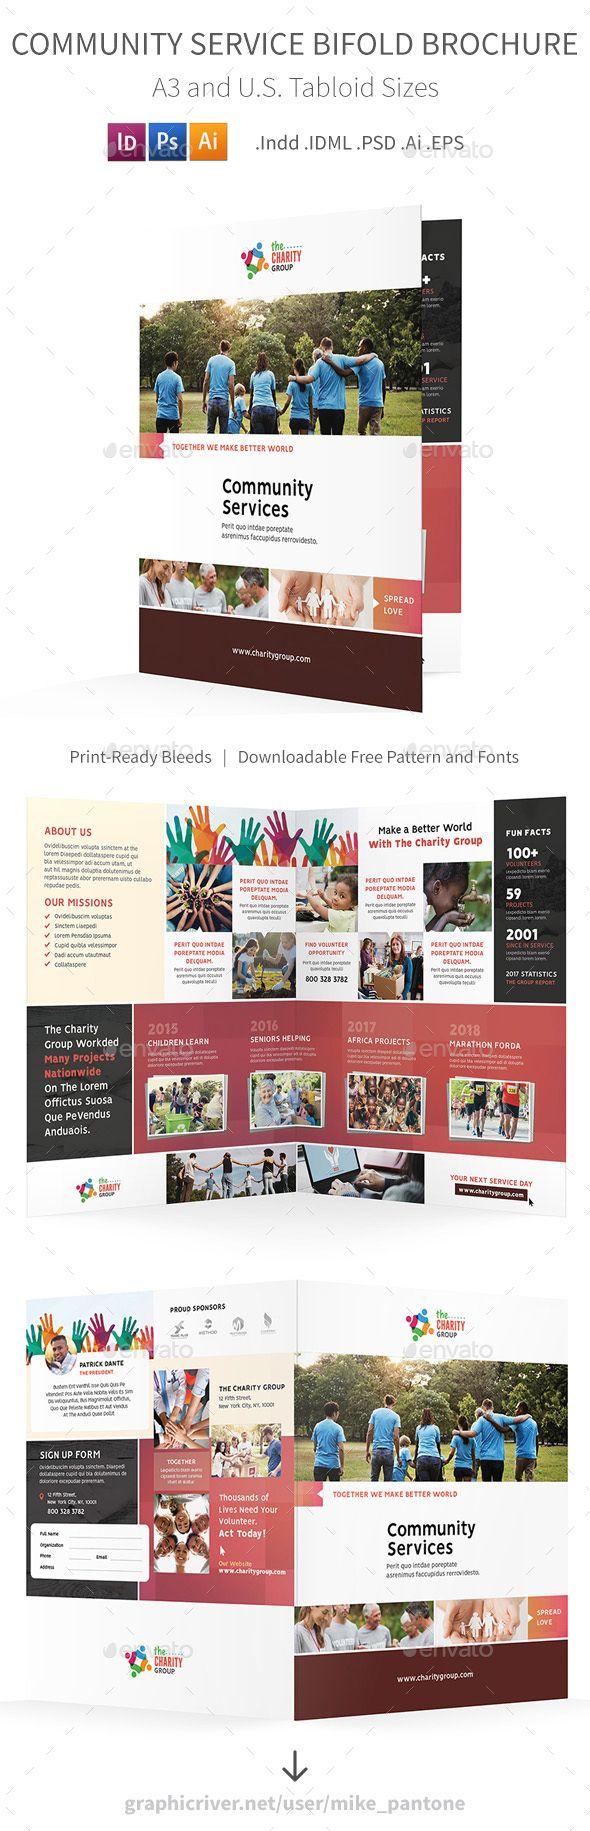 Community Service Bifold / Halffold Brochure 2